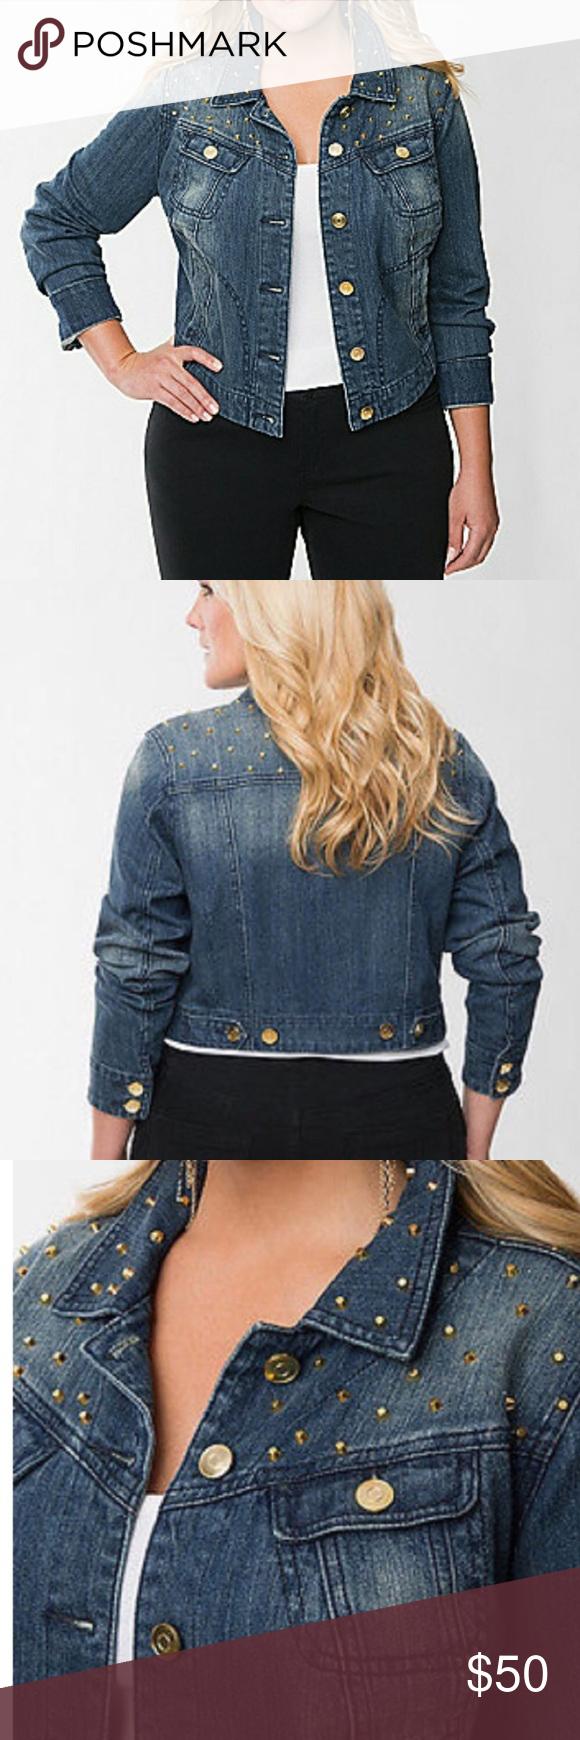 Lane Bryant Plus Size Studded Jean Jacket 18 Studded Jeans Long Sleeve Denim Jacket Jackets [ 1740 x 580 Pixel ]